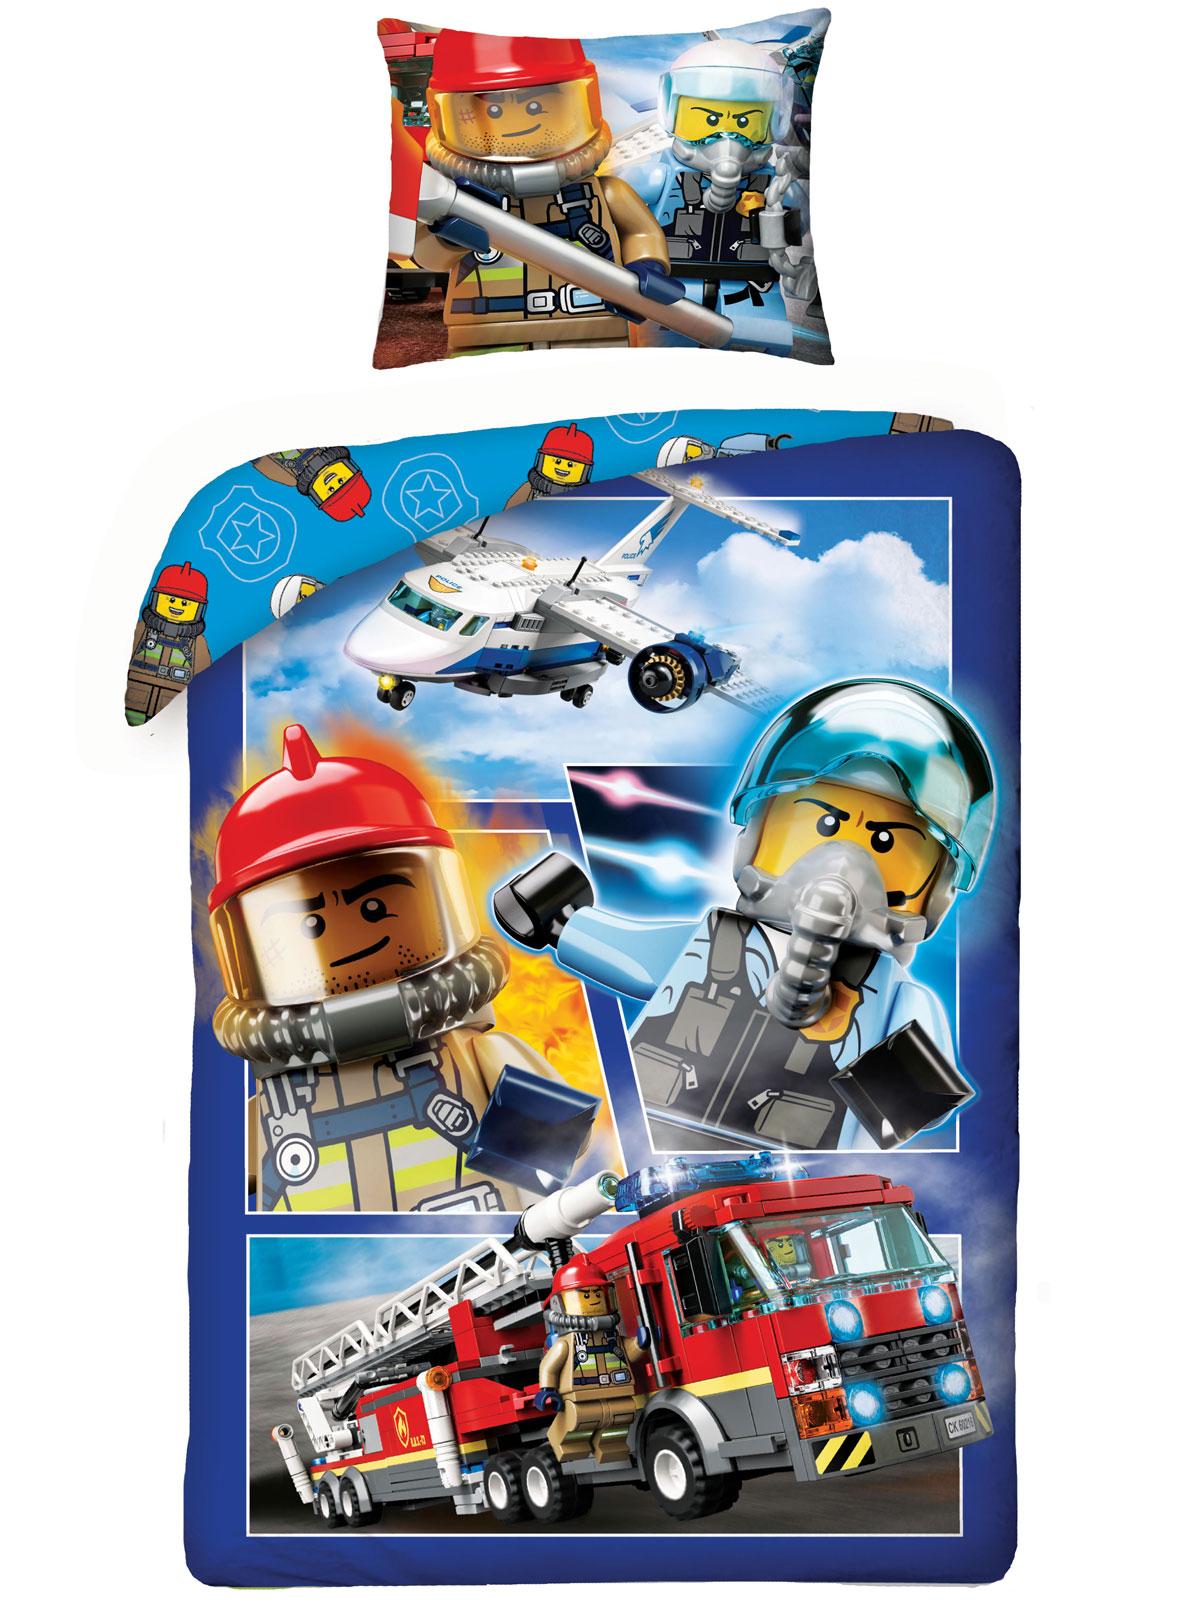 Lego City Single Cotton Duvet Cover Set - European Size